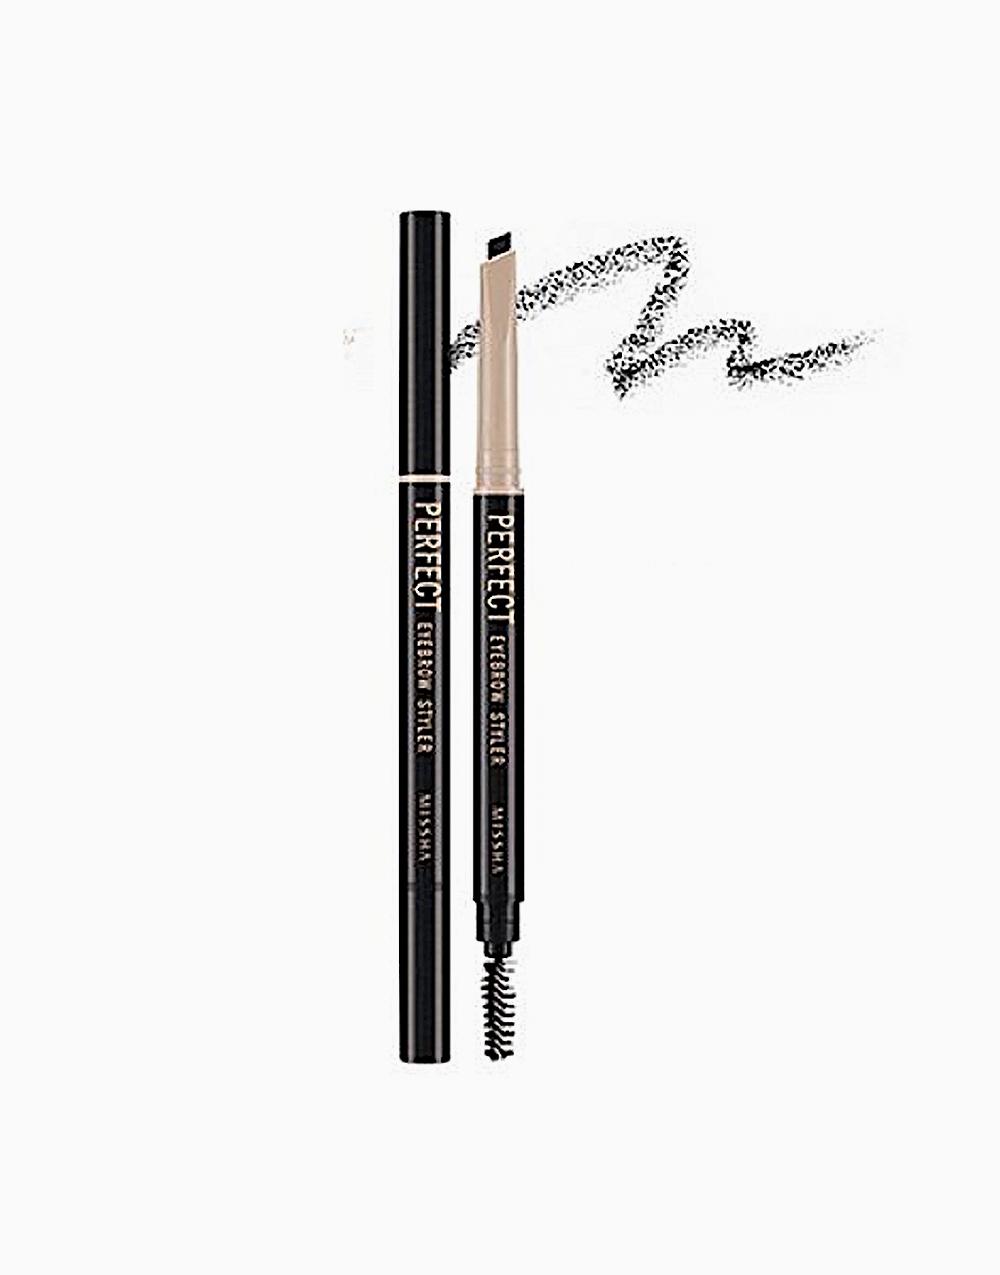 Perfect Eyebrow Styler by Missha | M9582 Black